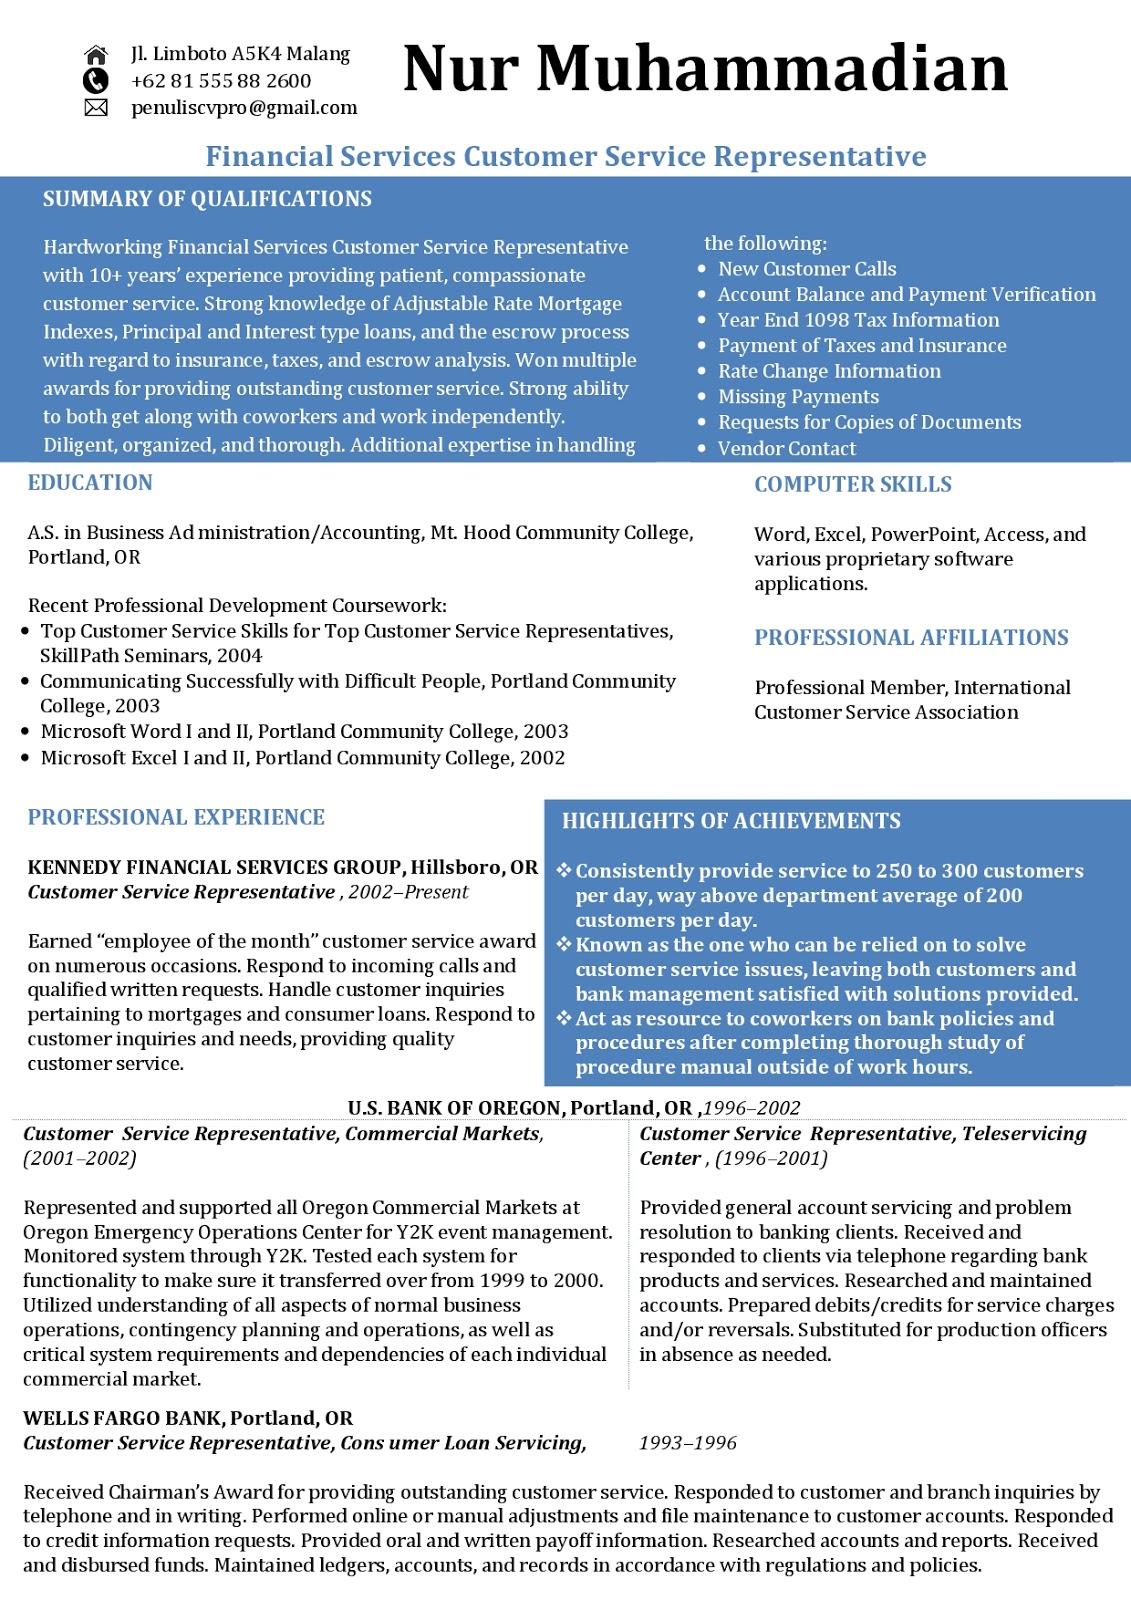 Contoh Curriculum Vitae Bahasa Inggris : Financial Services - Customer Service Representative